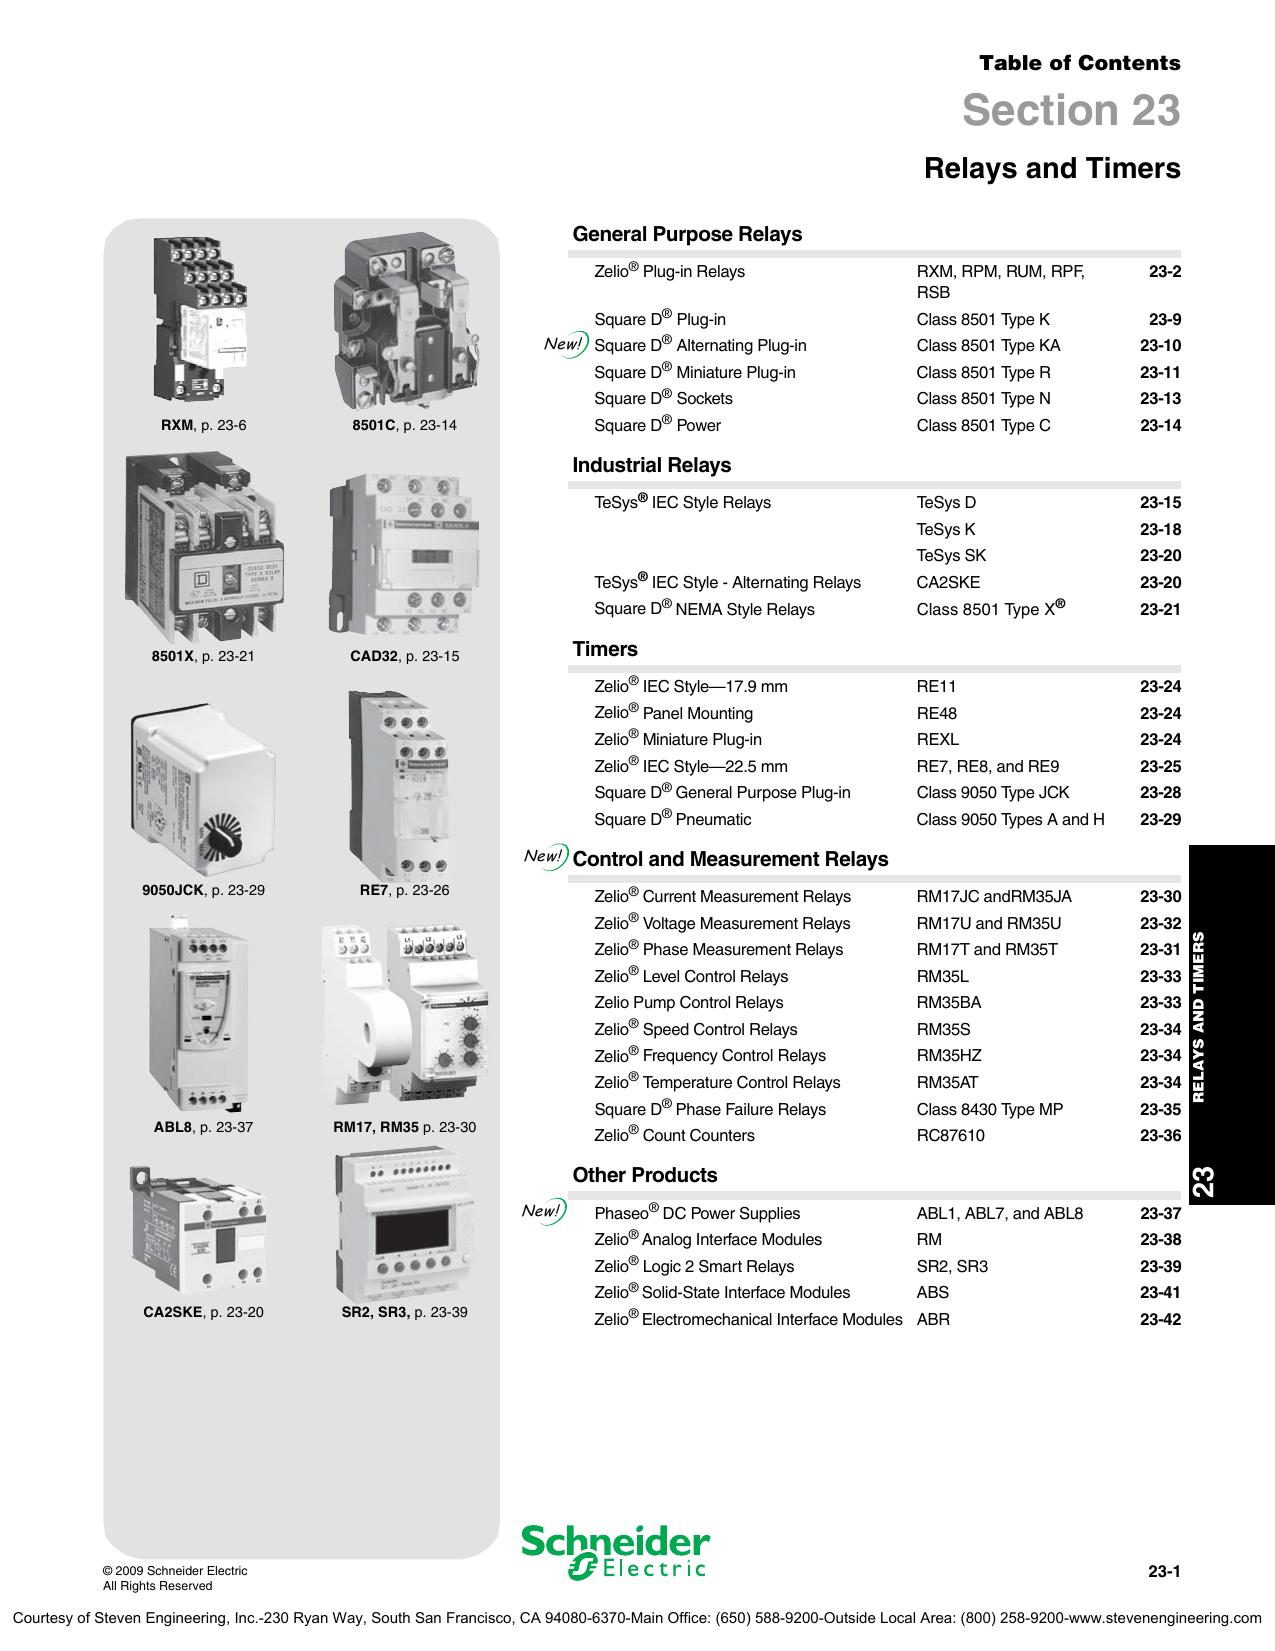 schneider electric digest 175 relays and rh studyres com